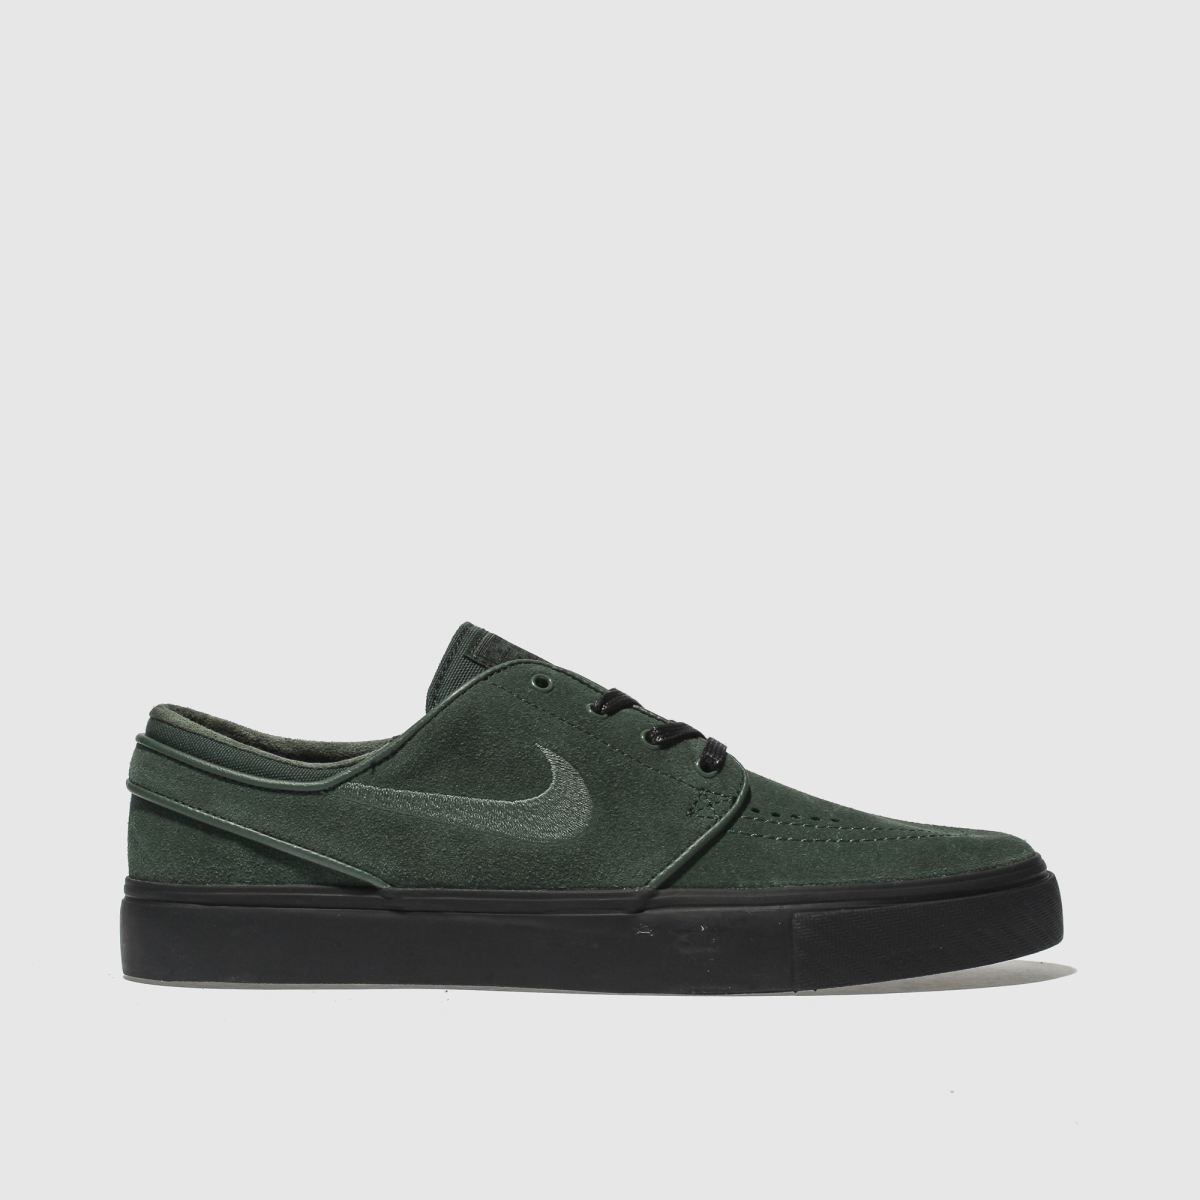 Nike Sb Dark Green Zoom Stefan Janoski Trainers